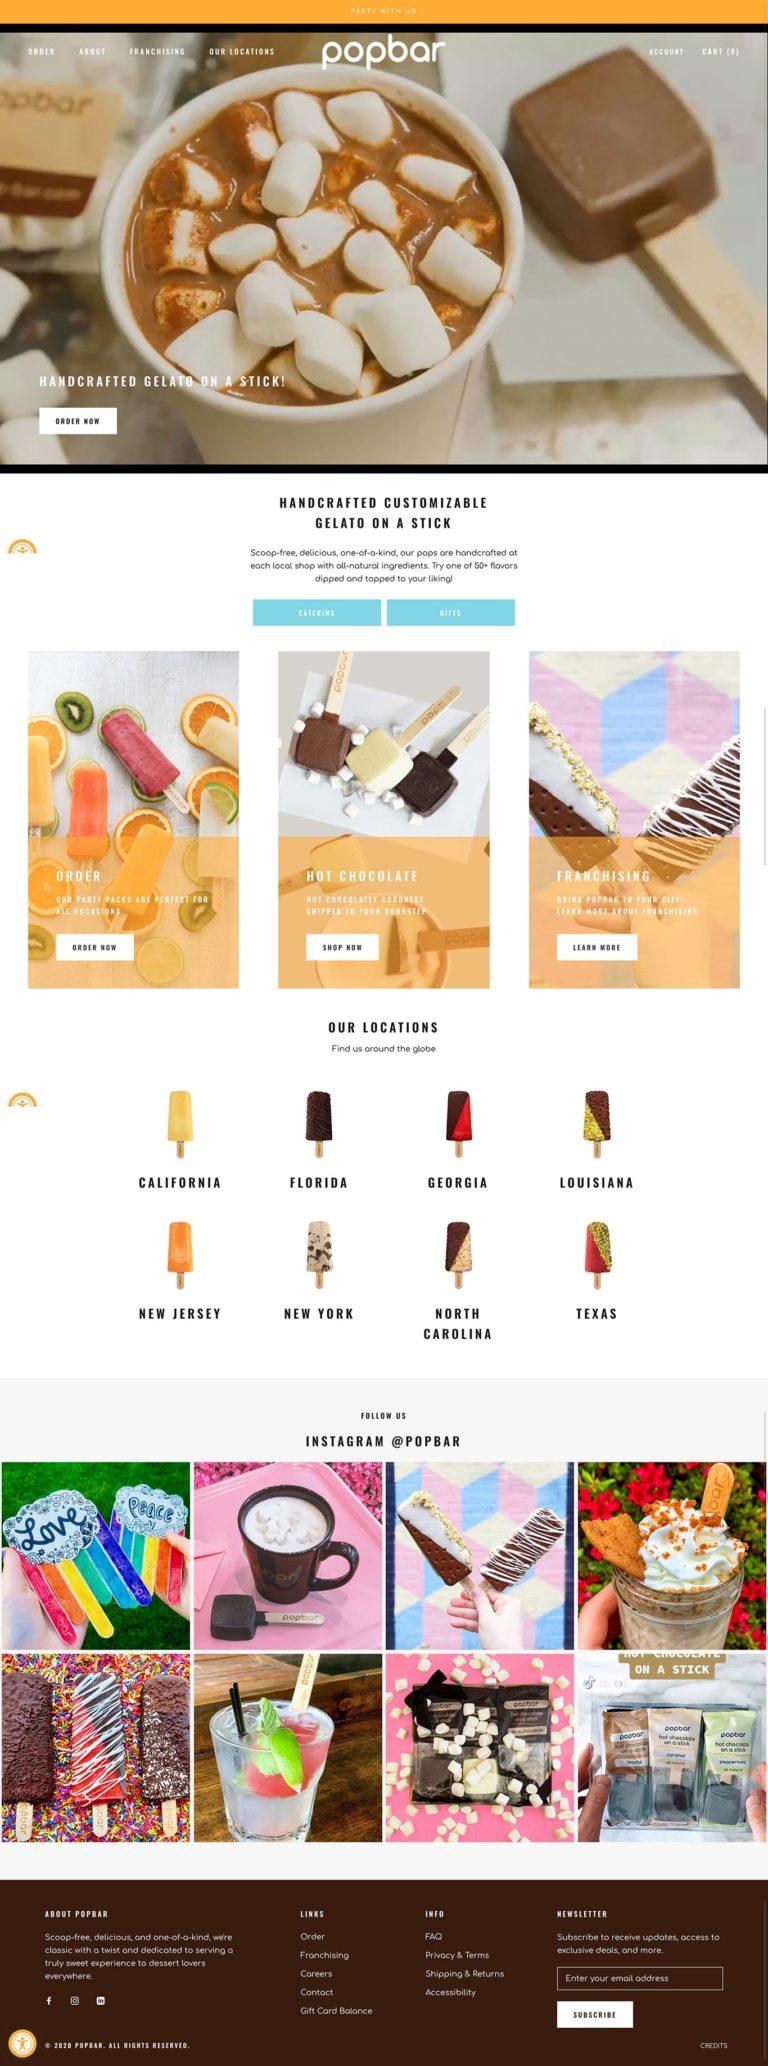 Frozen desserts, chocolate sticks and more treats | pop-bar.com